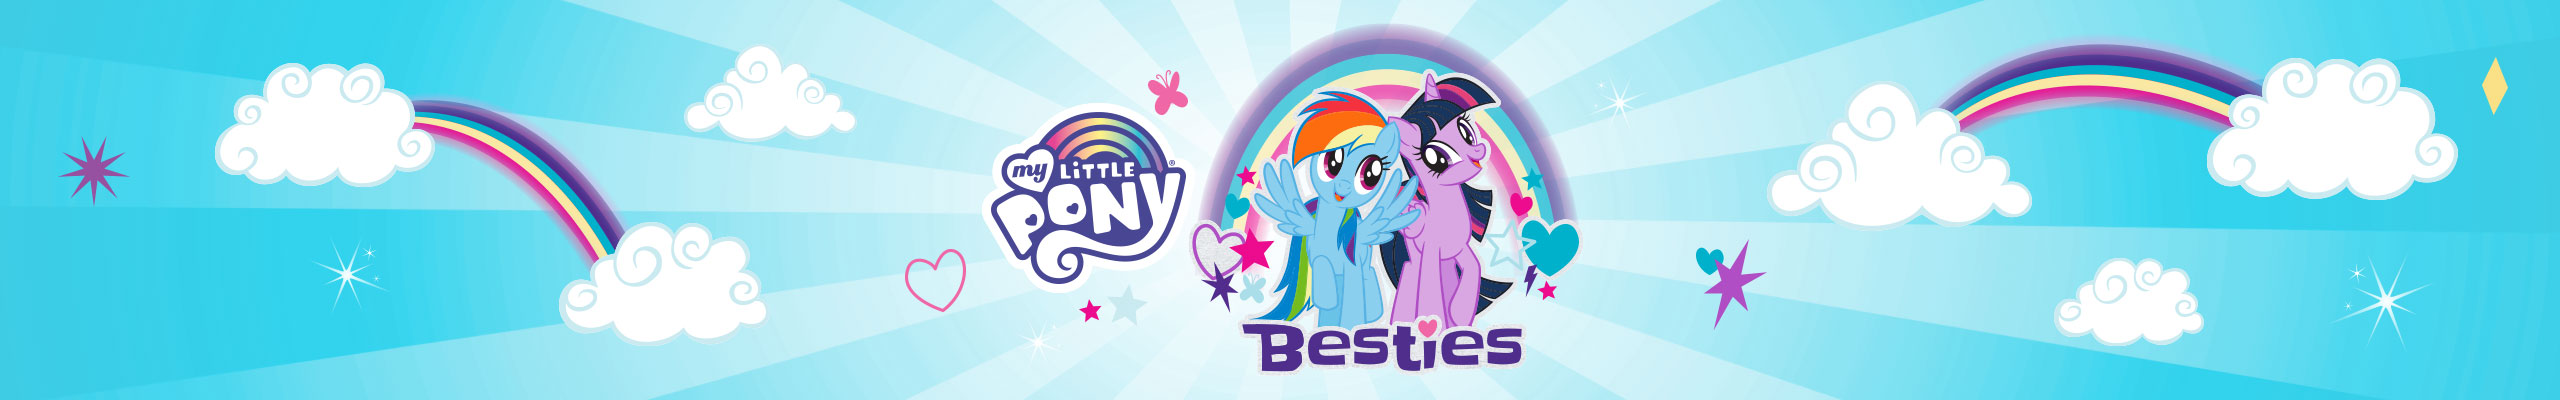 banner my little pony